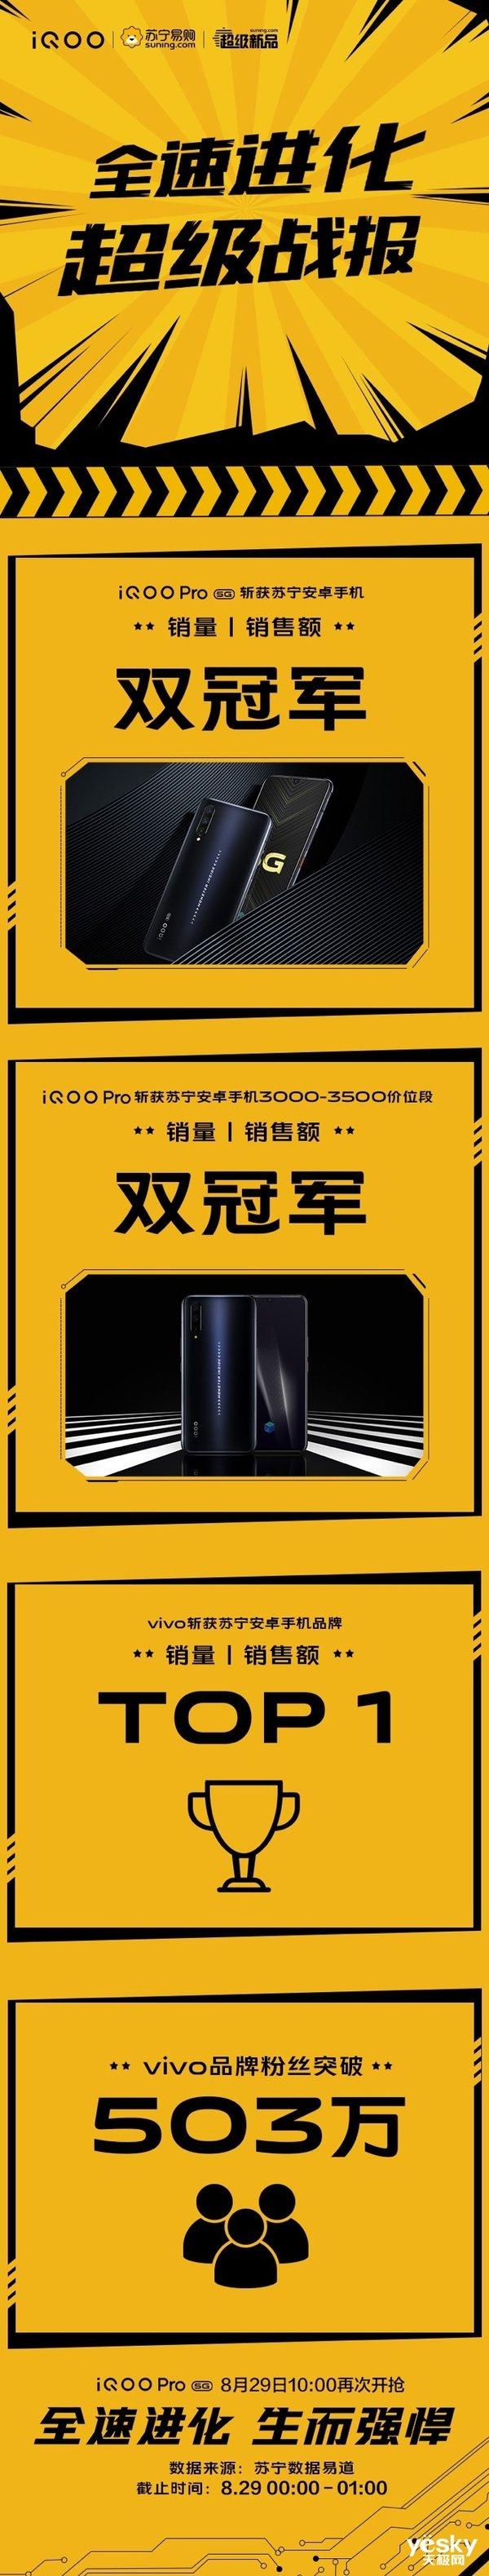 iQOO  Pro  4G版正式首发 斩获电商平台销量销售额双冠军